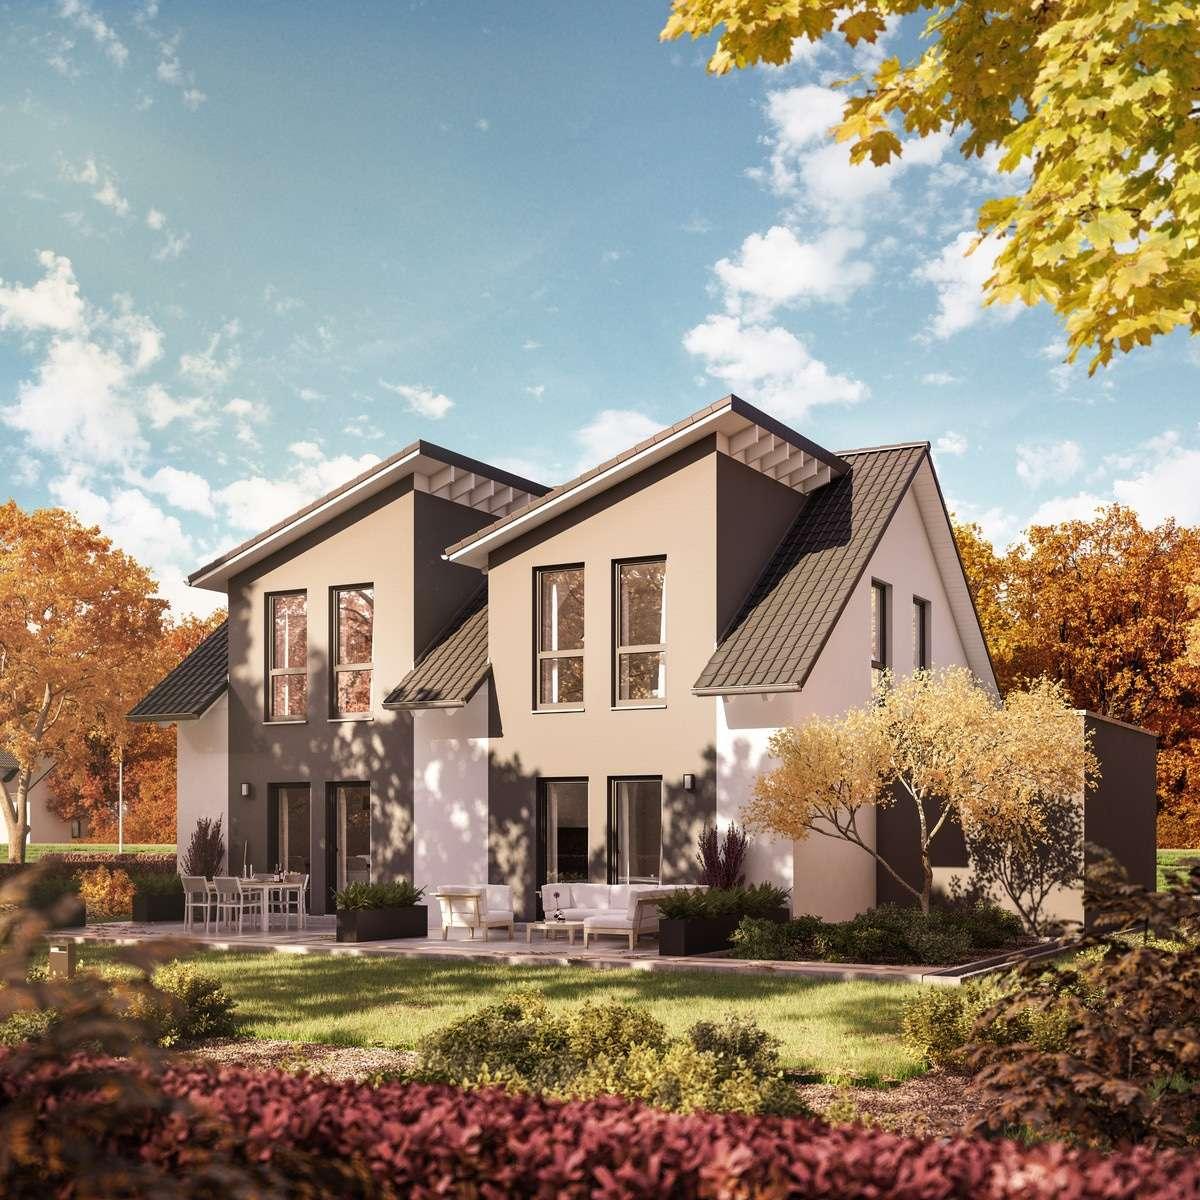 massa haus musterhauszentrum sievershagen b rostock. Black Bedroom Furniture Sets. Home Design Ideas